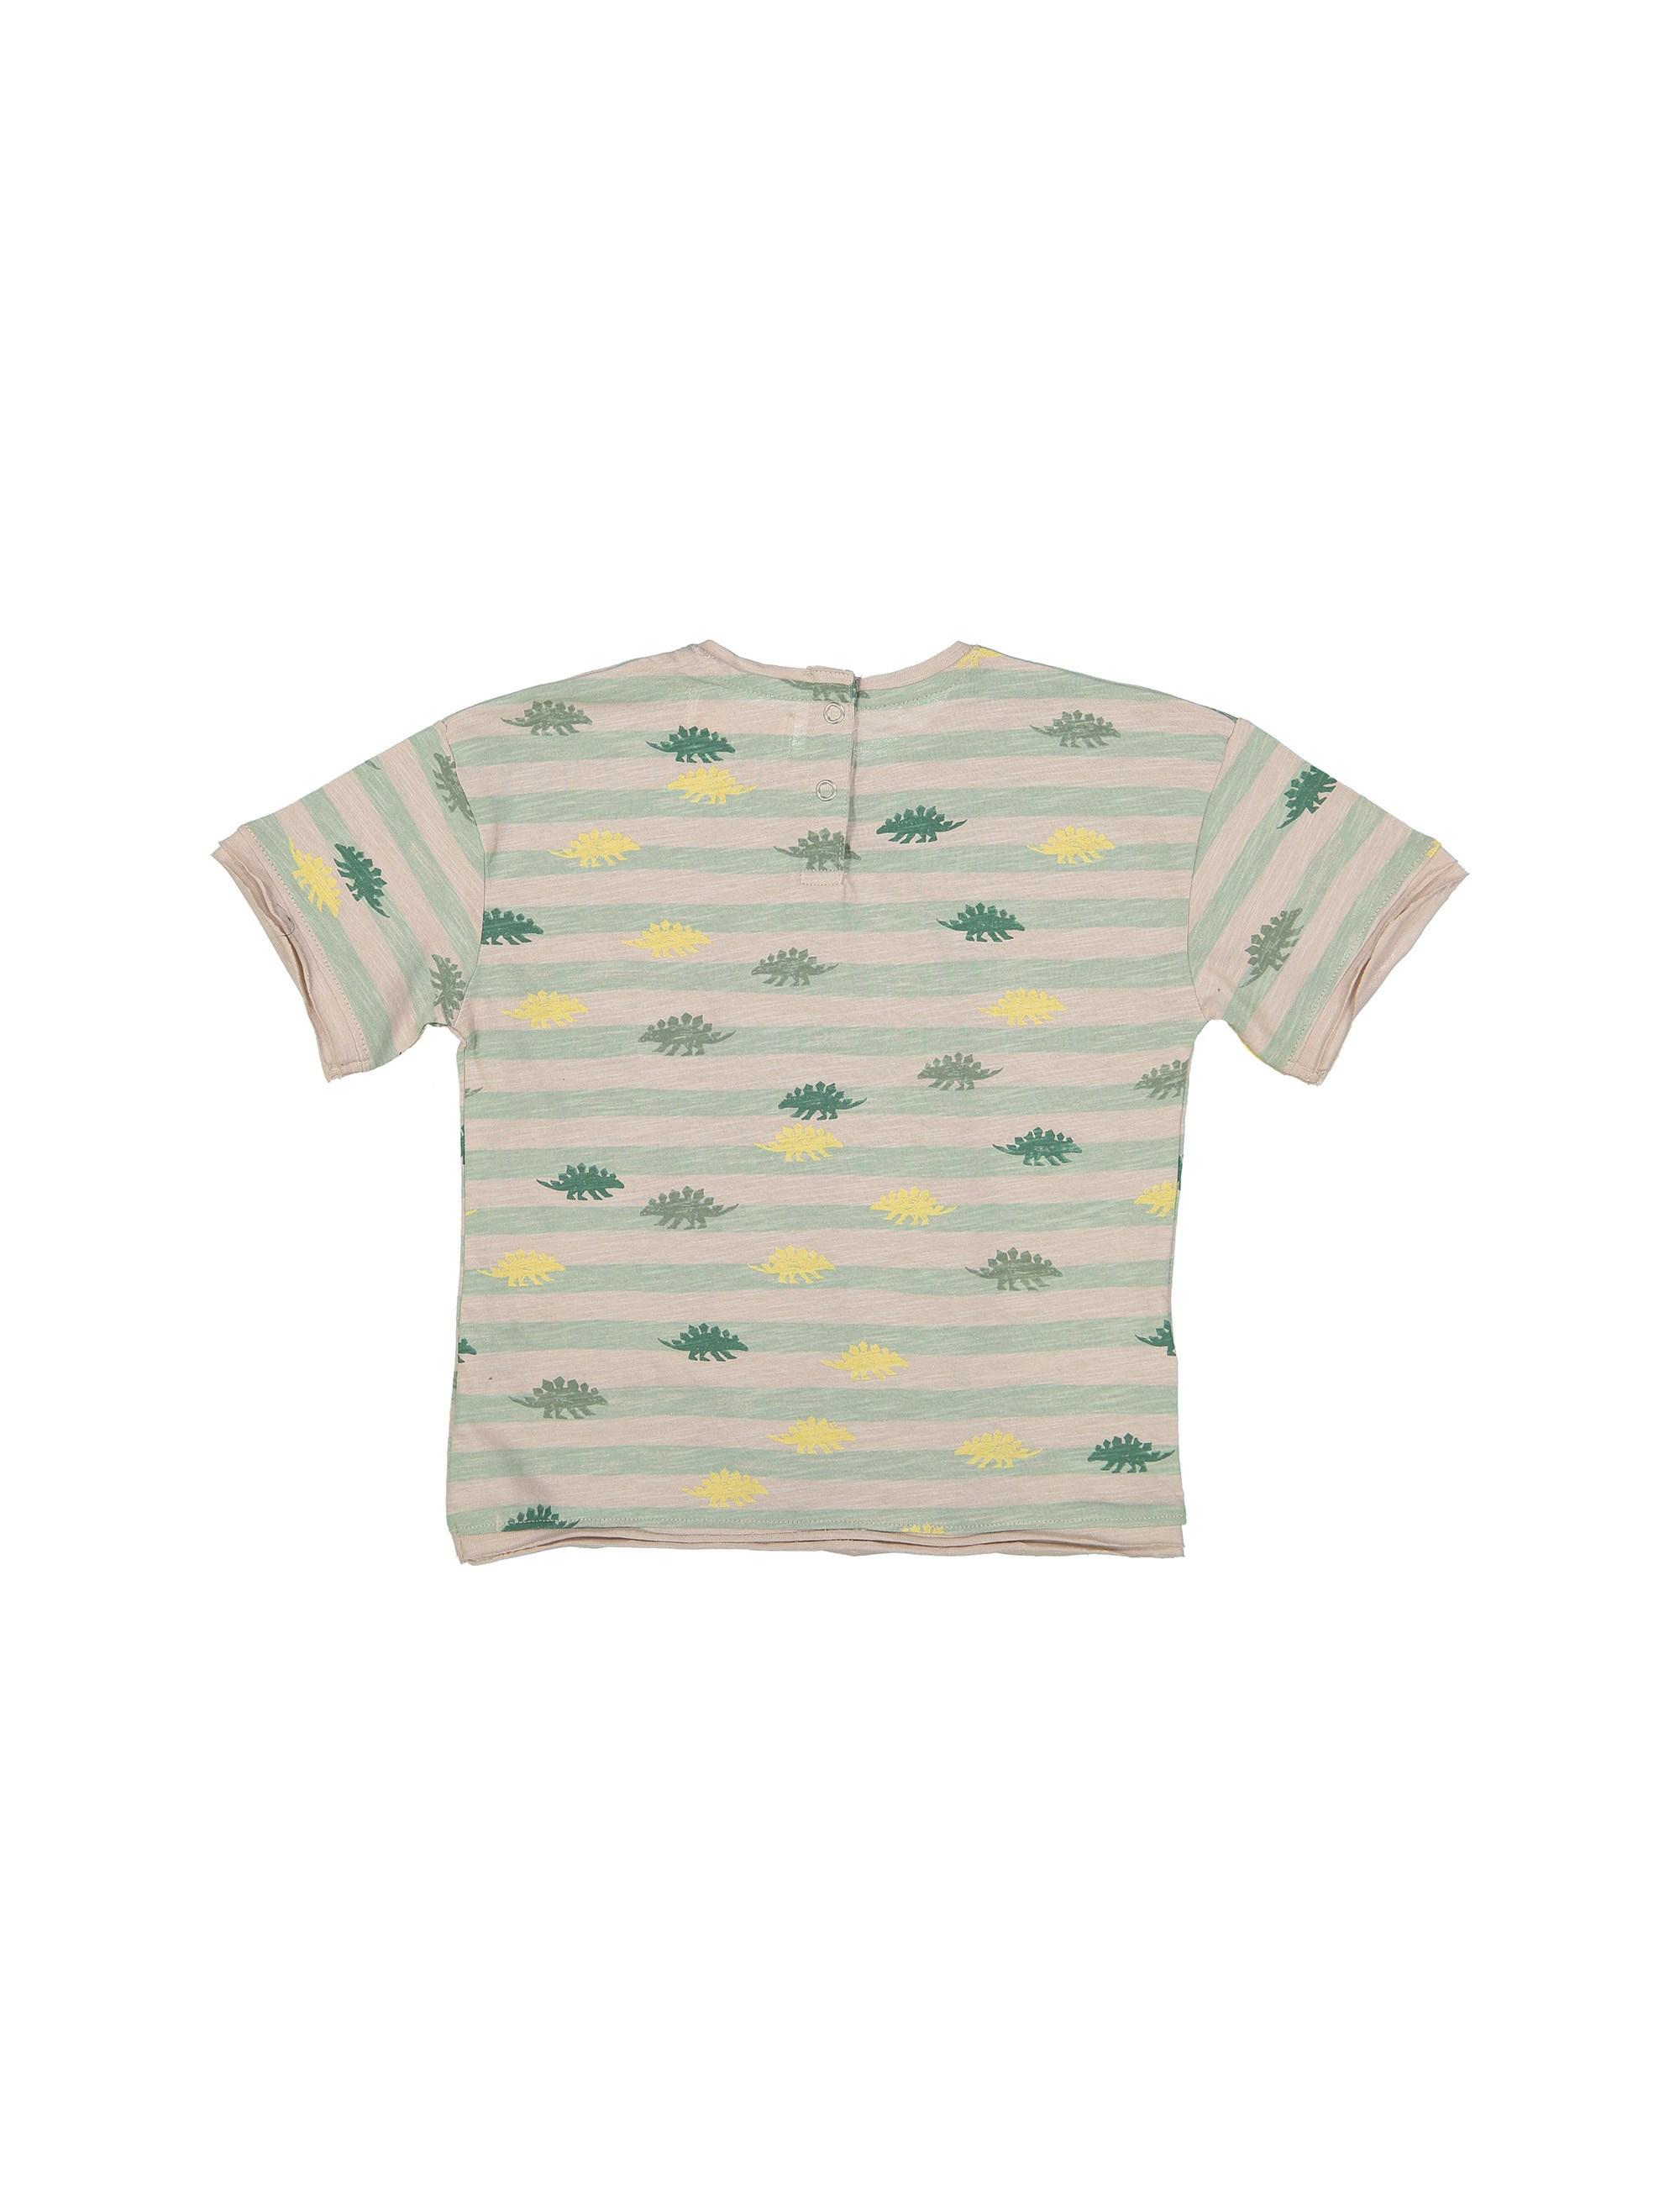 تی شرت نخی طرح دار نوزادی پسرانه - مانگو